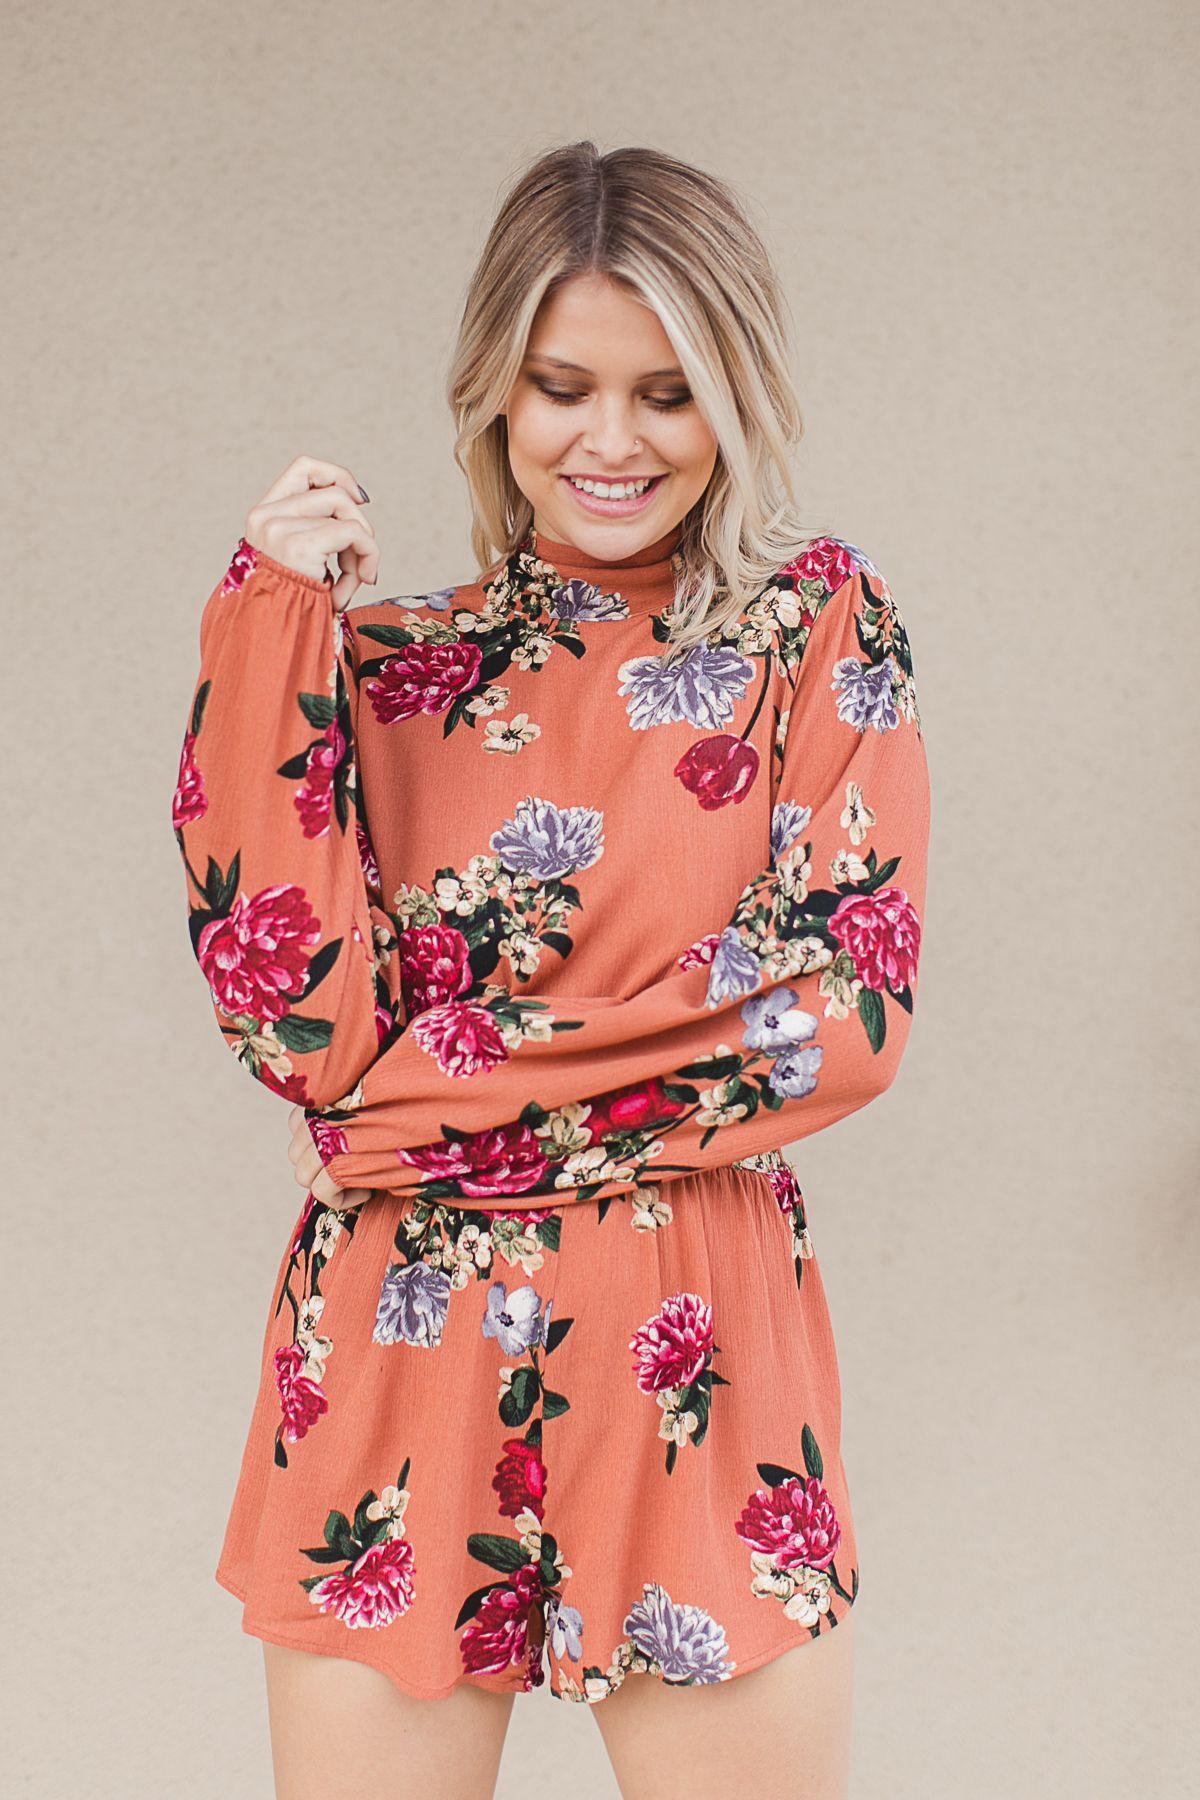 Denim Romper - Lindsay Marcella   Fashion, Summer trends